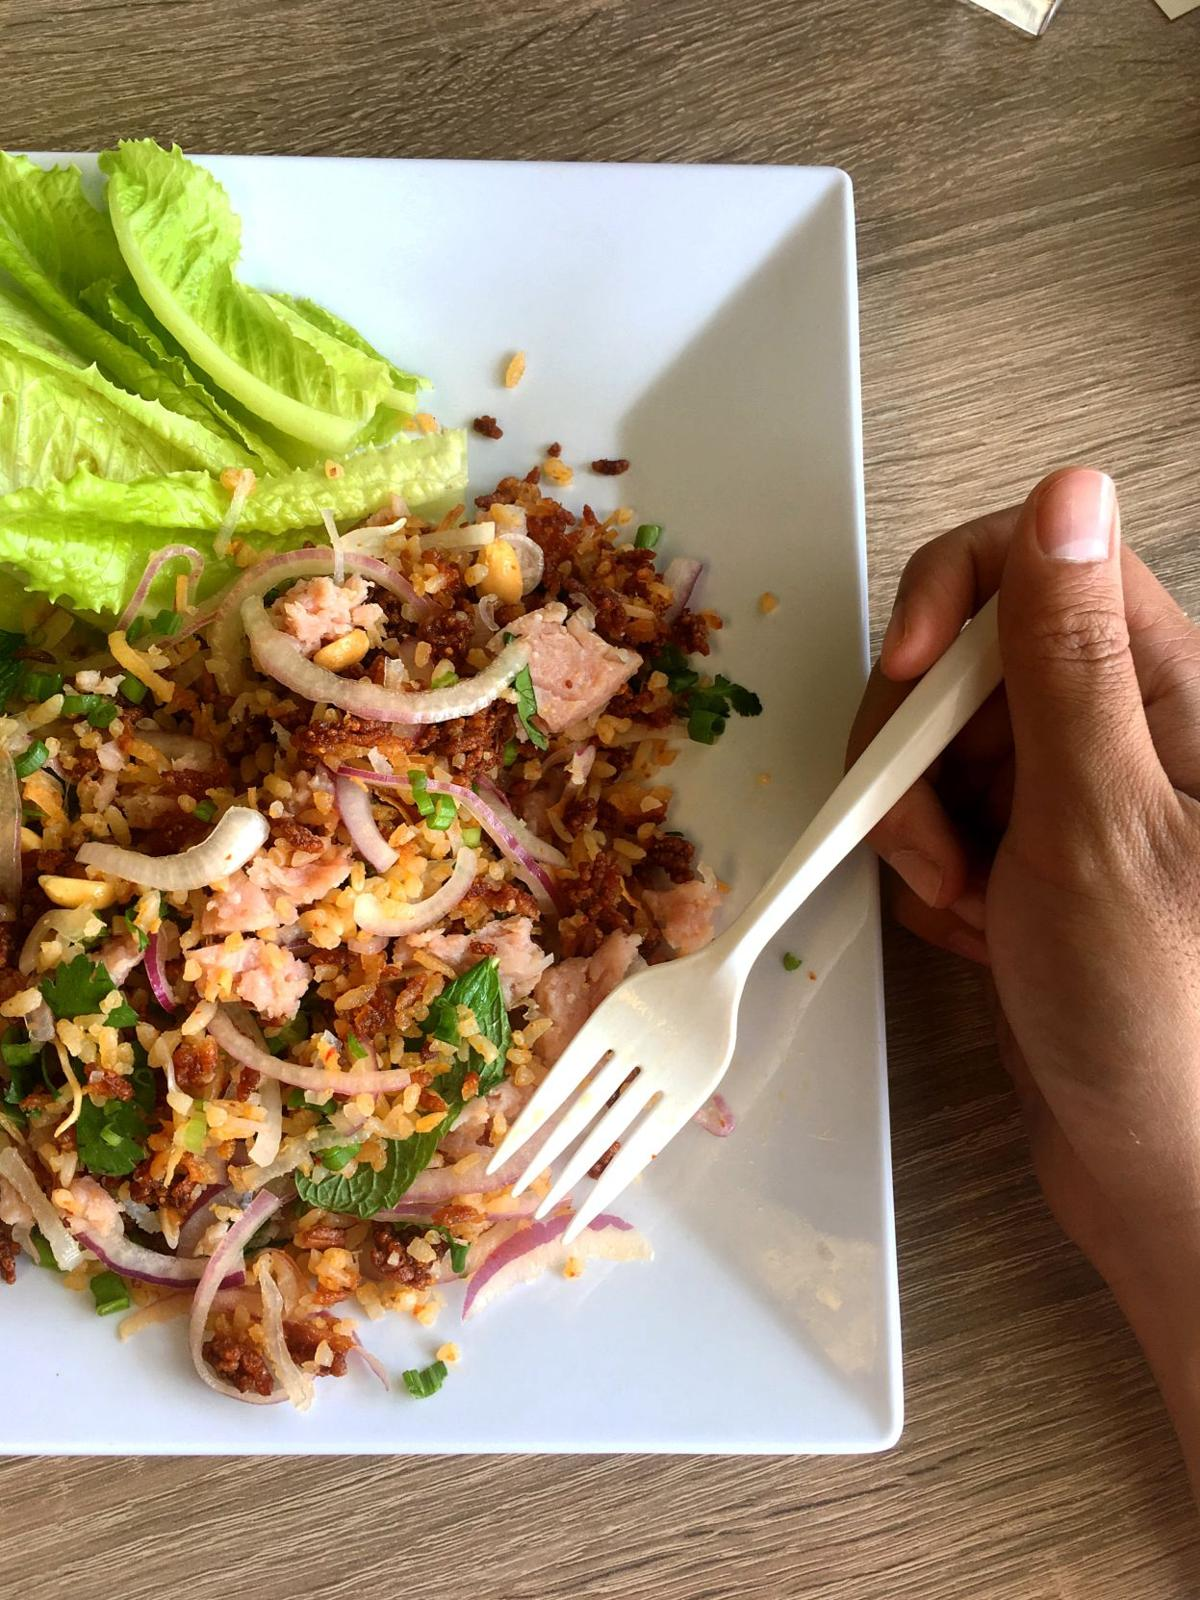 Duke's Pad Thai crispy rice salad